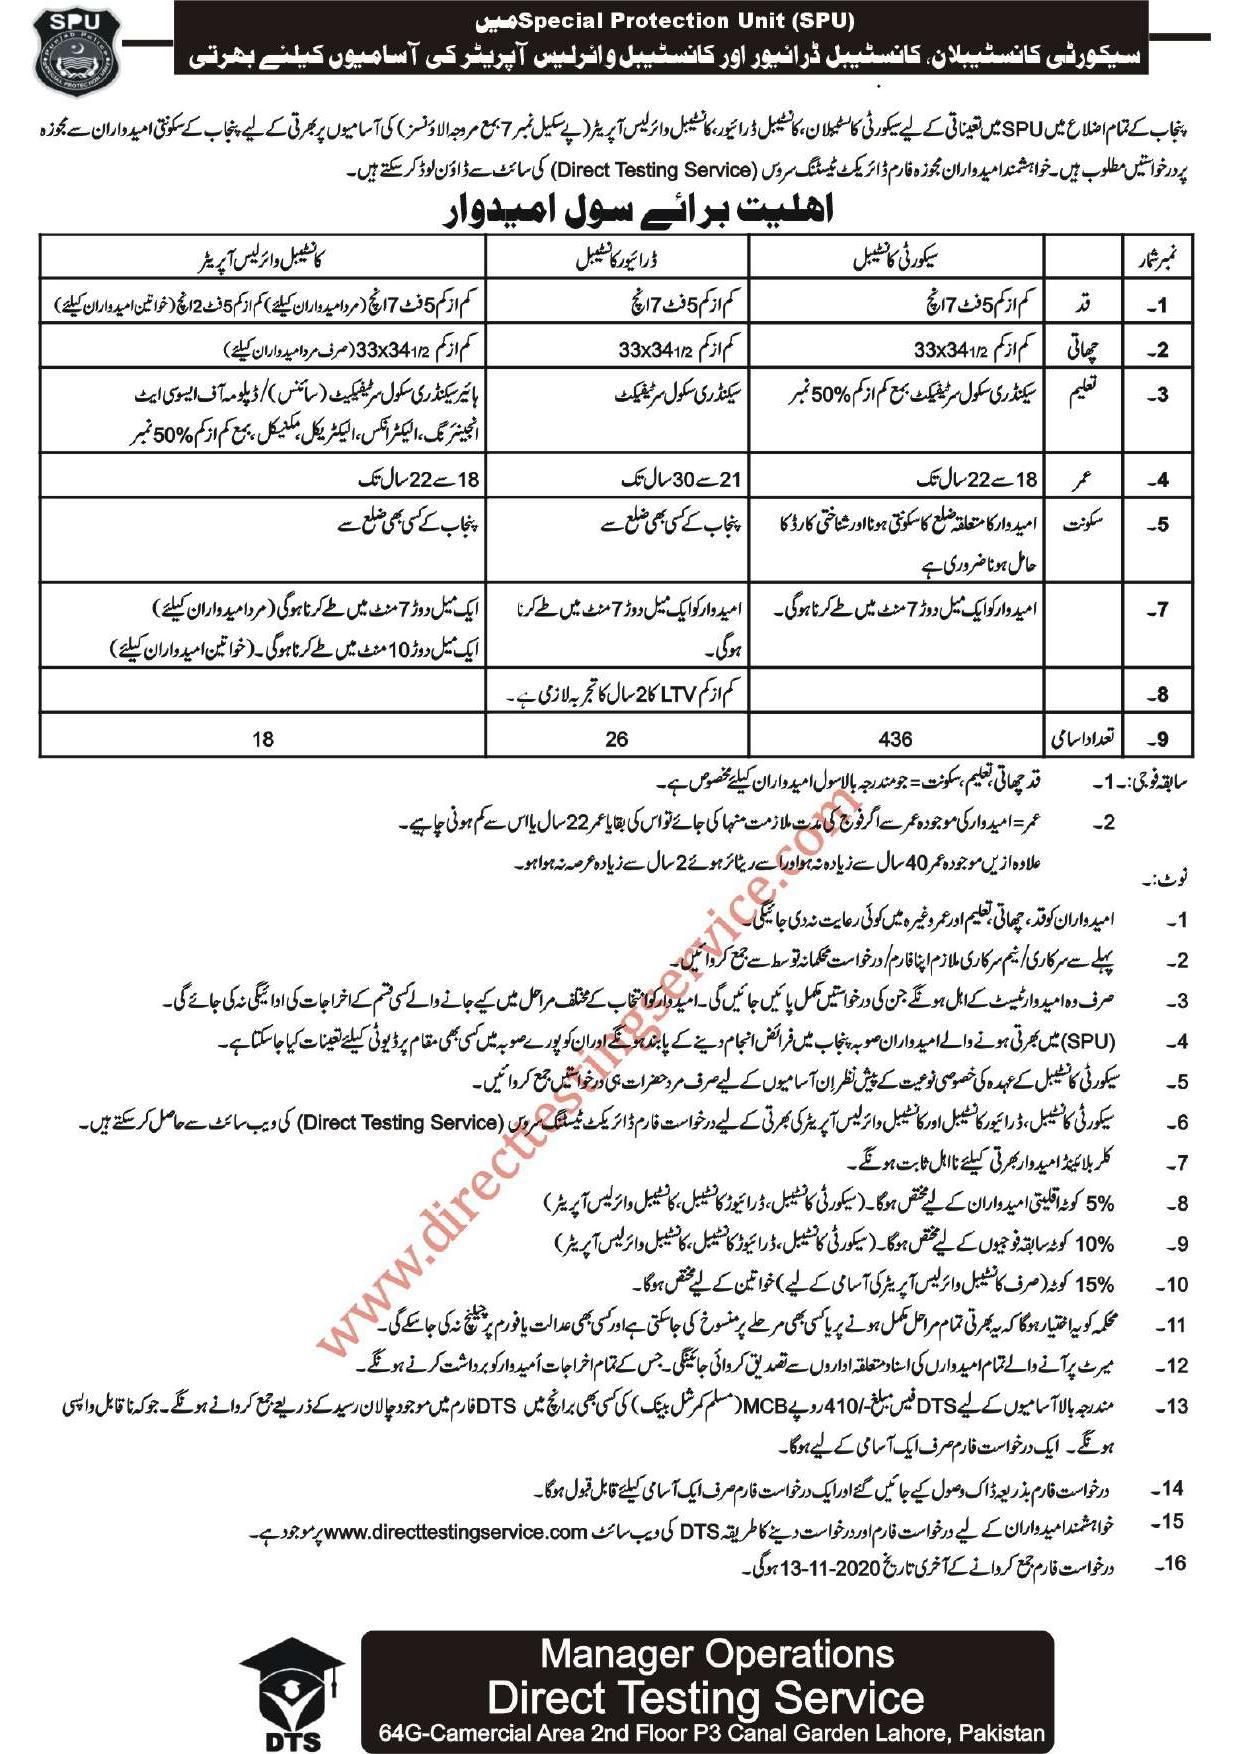 SPU Punjab Police Jobs 2020